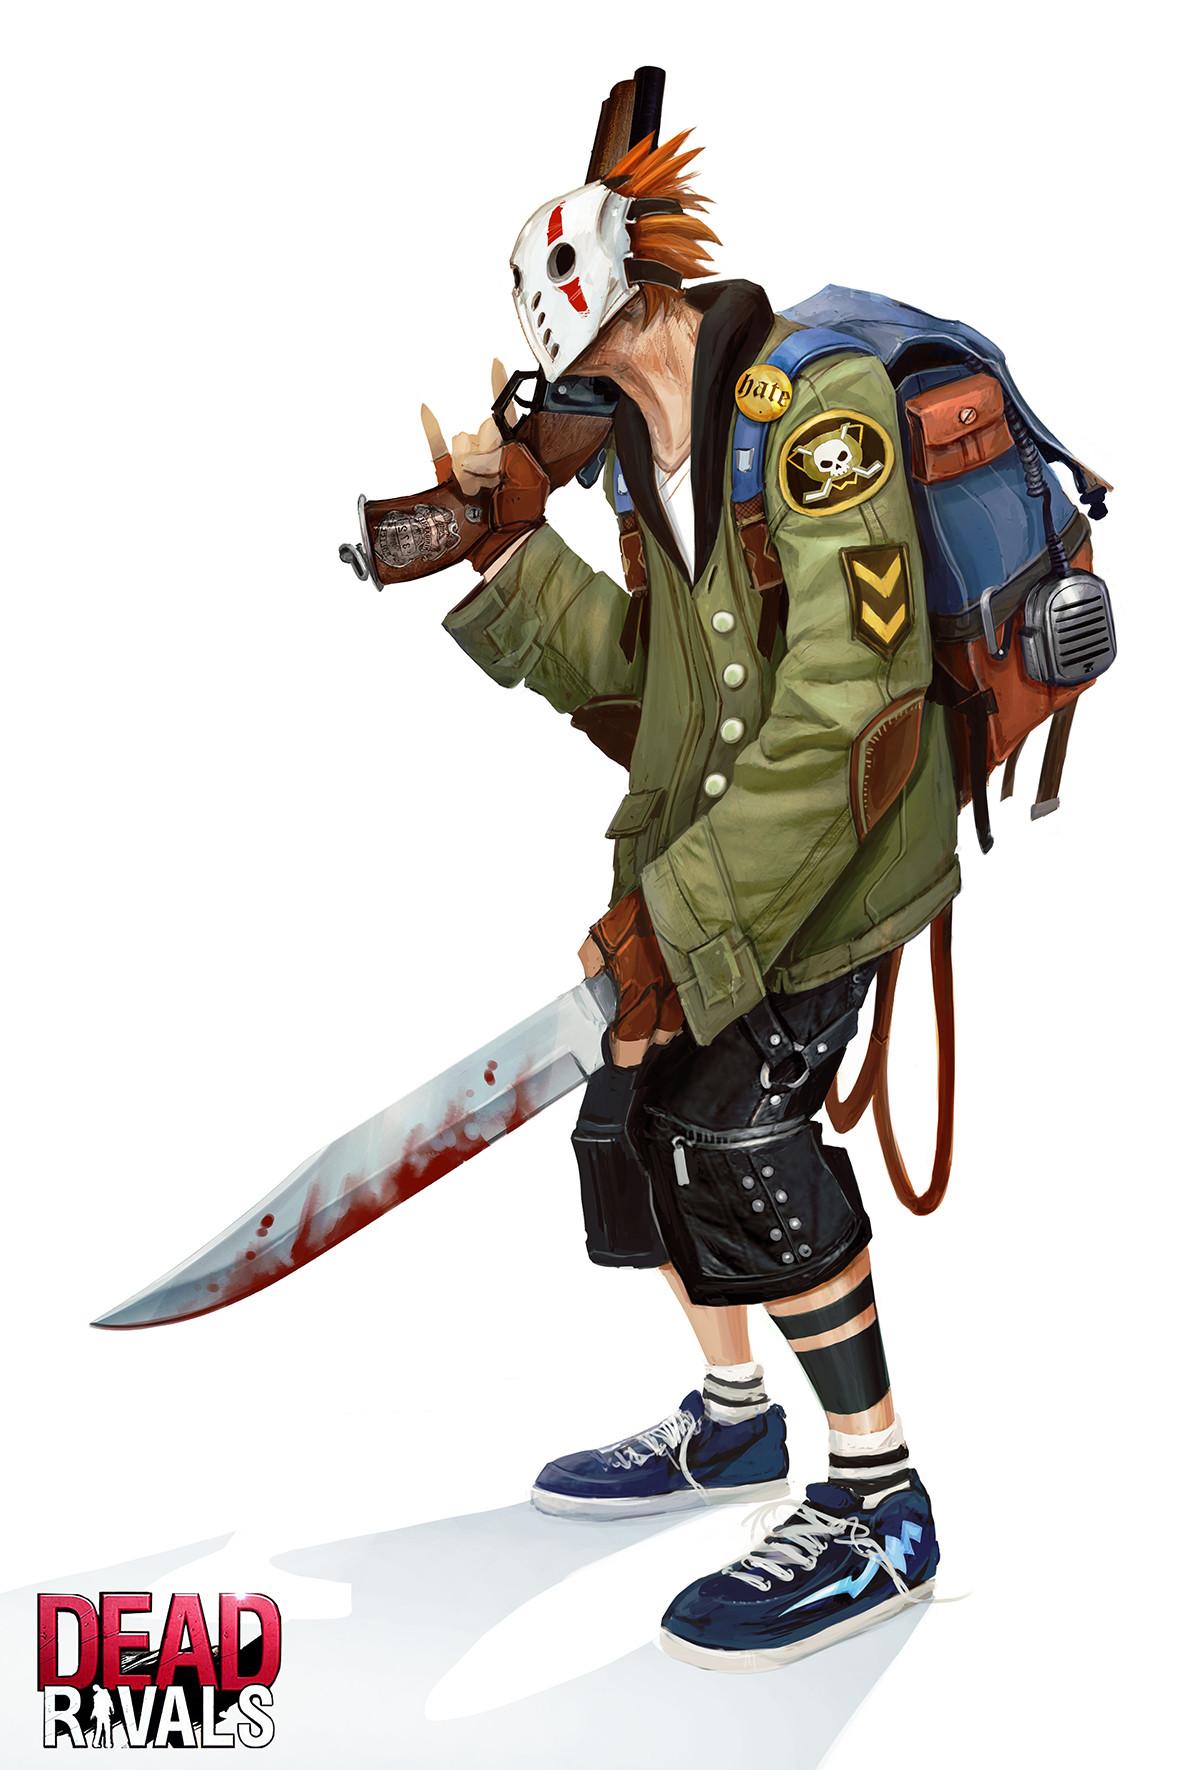 Alexandre chaudret zombiemmo character mask04